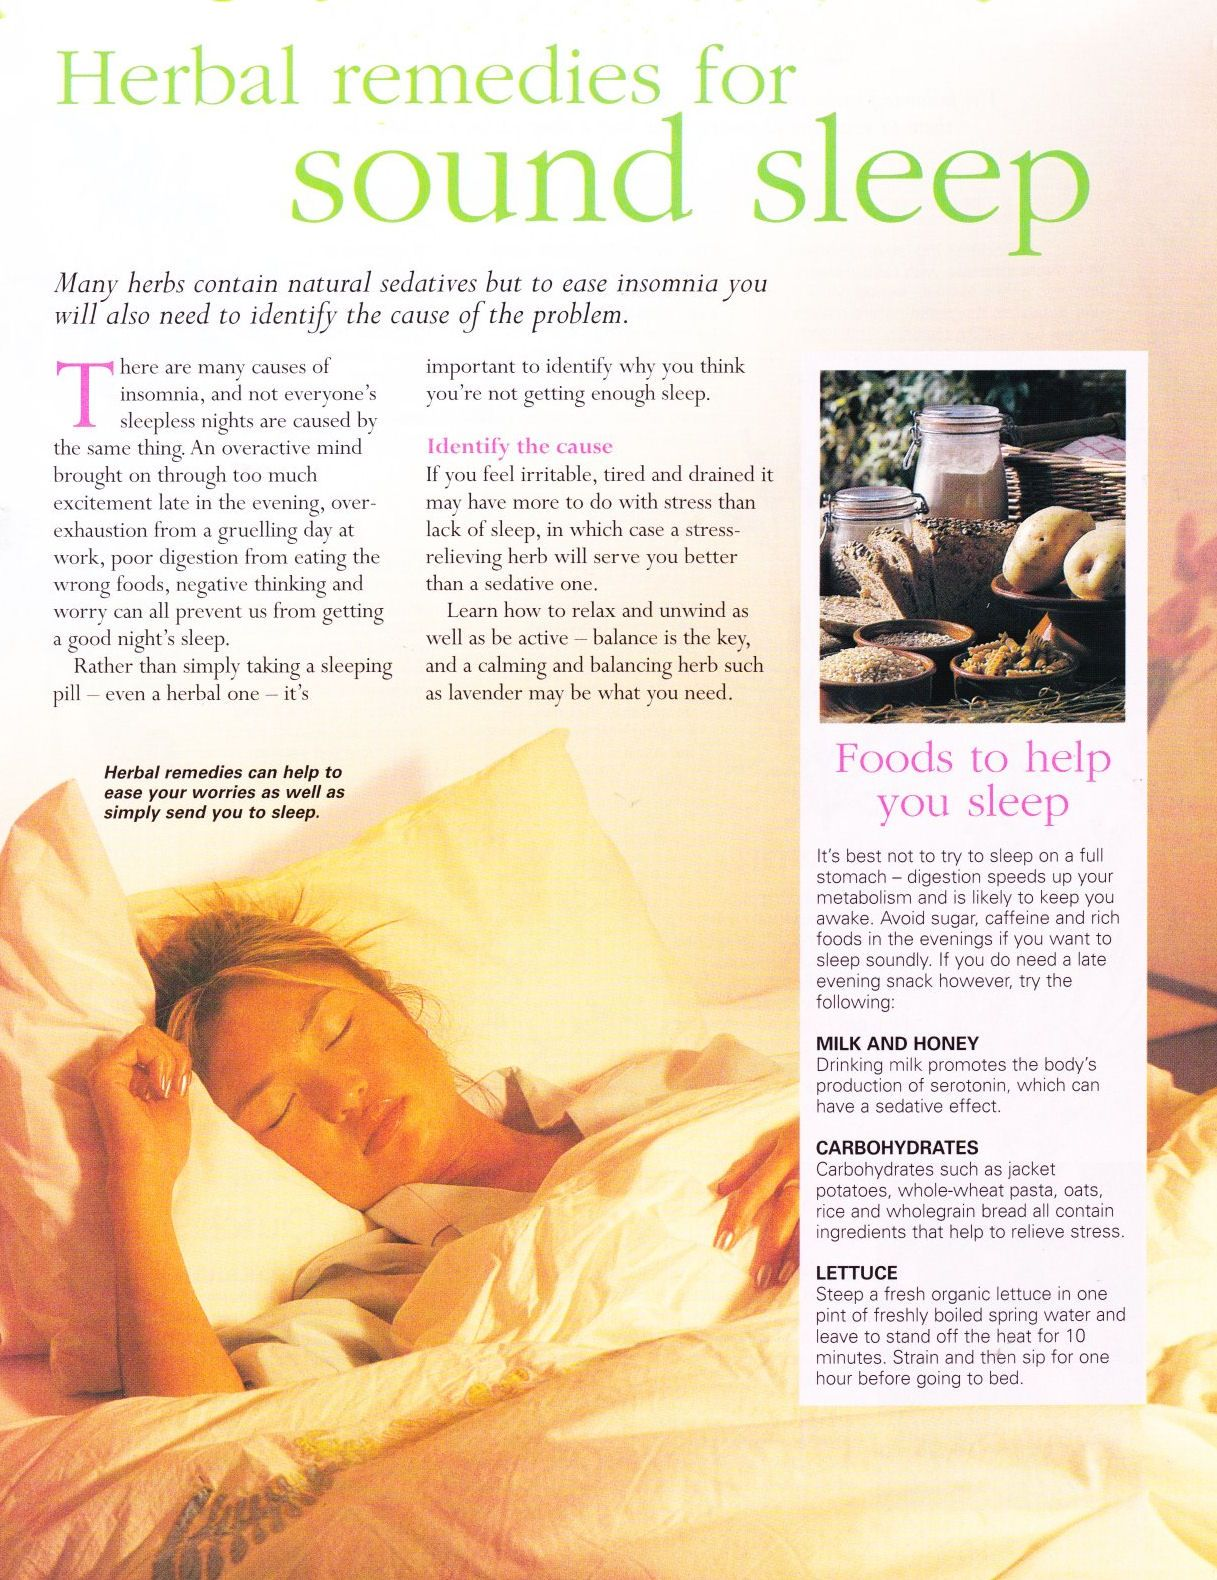 herbal remedies for sound sleep sant nutrition herbs. Black Bedroom Furniture Sets. Home Design Ideas